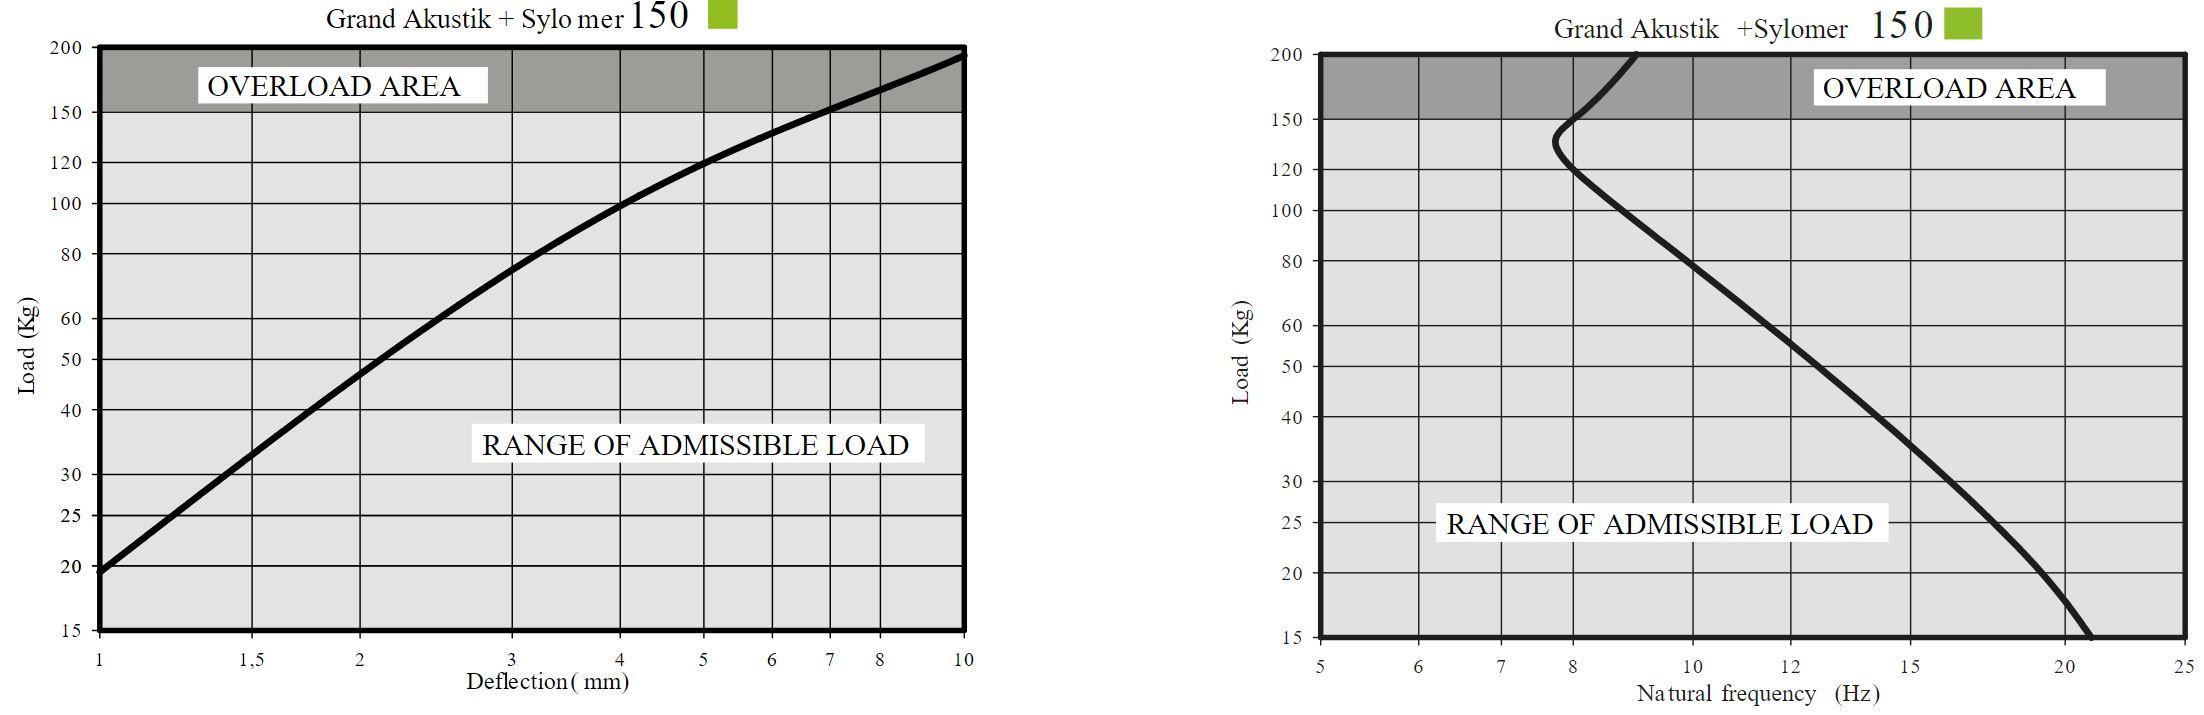 Grand Akustik 1 + Sylomer Curve 2